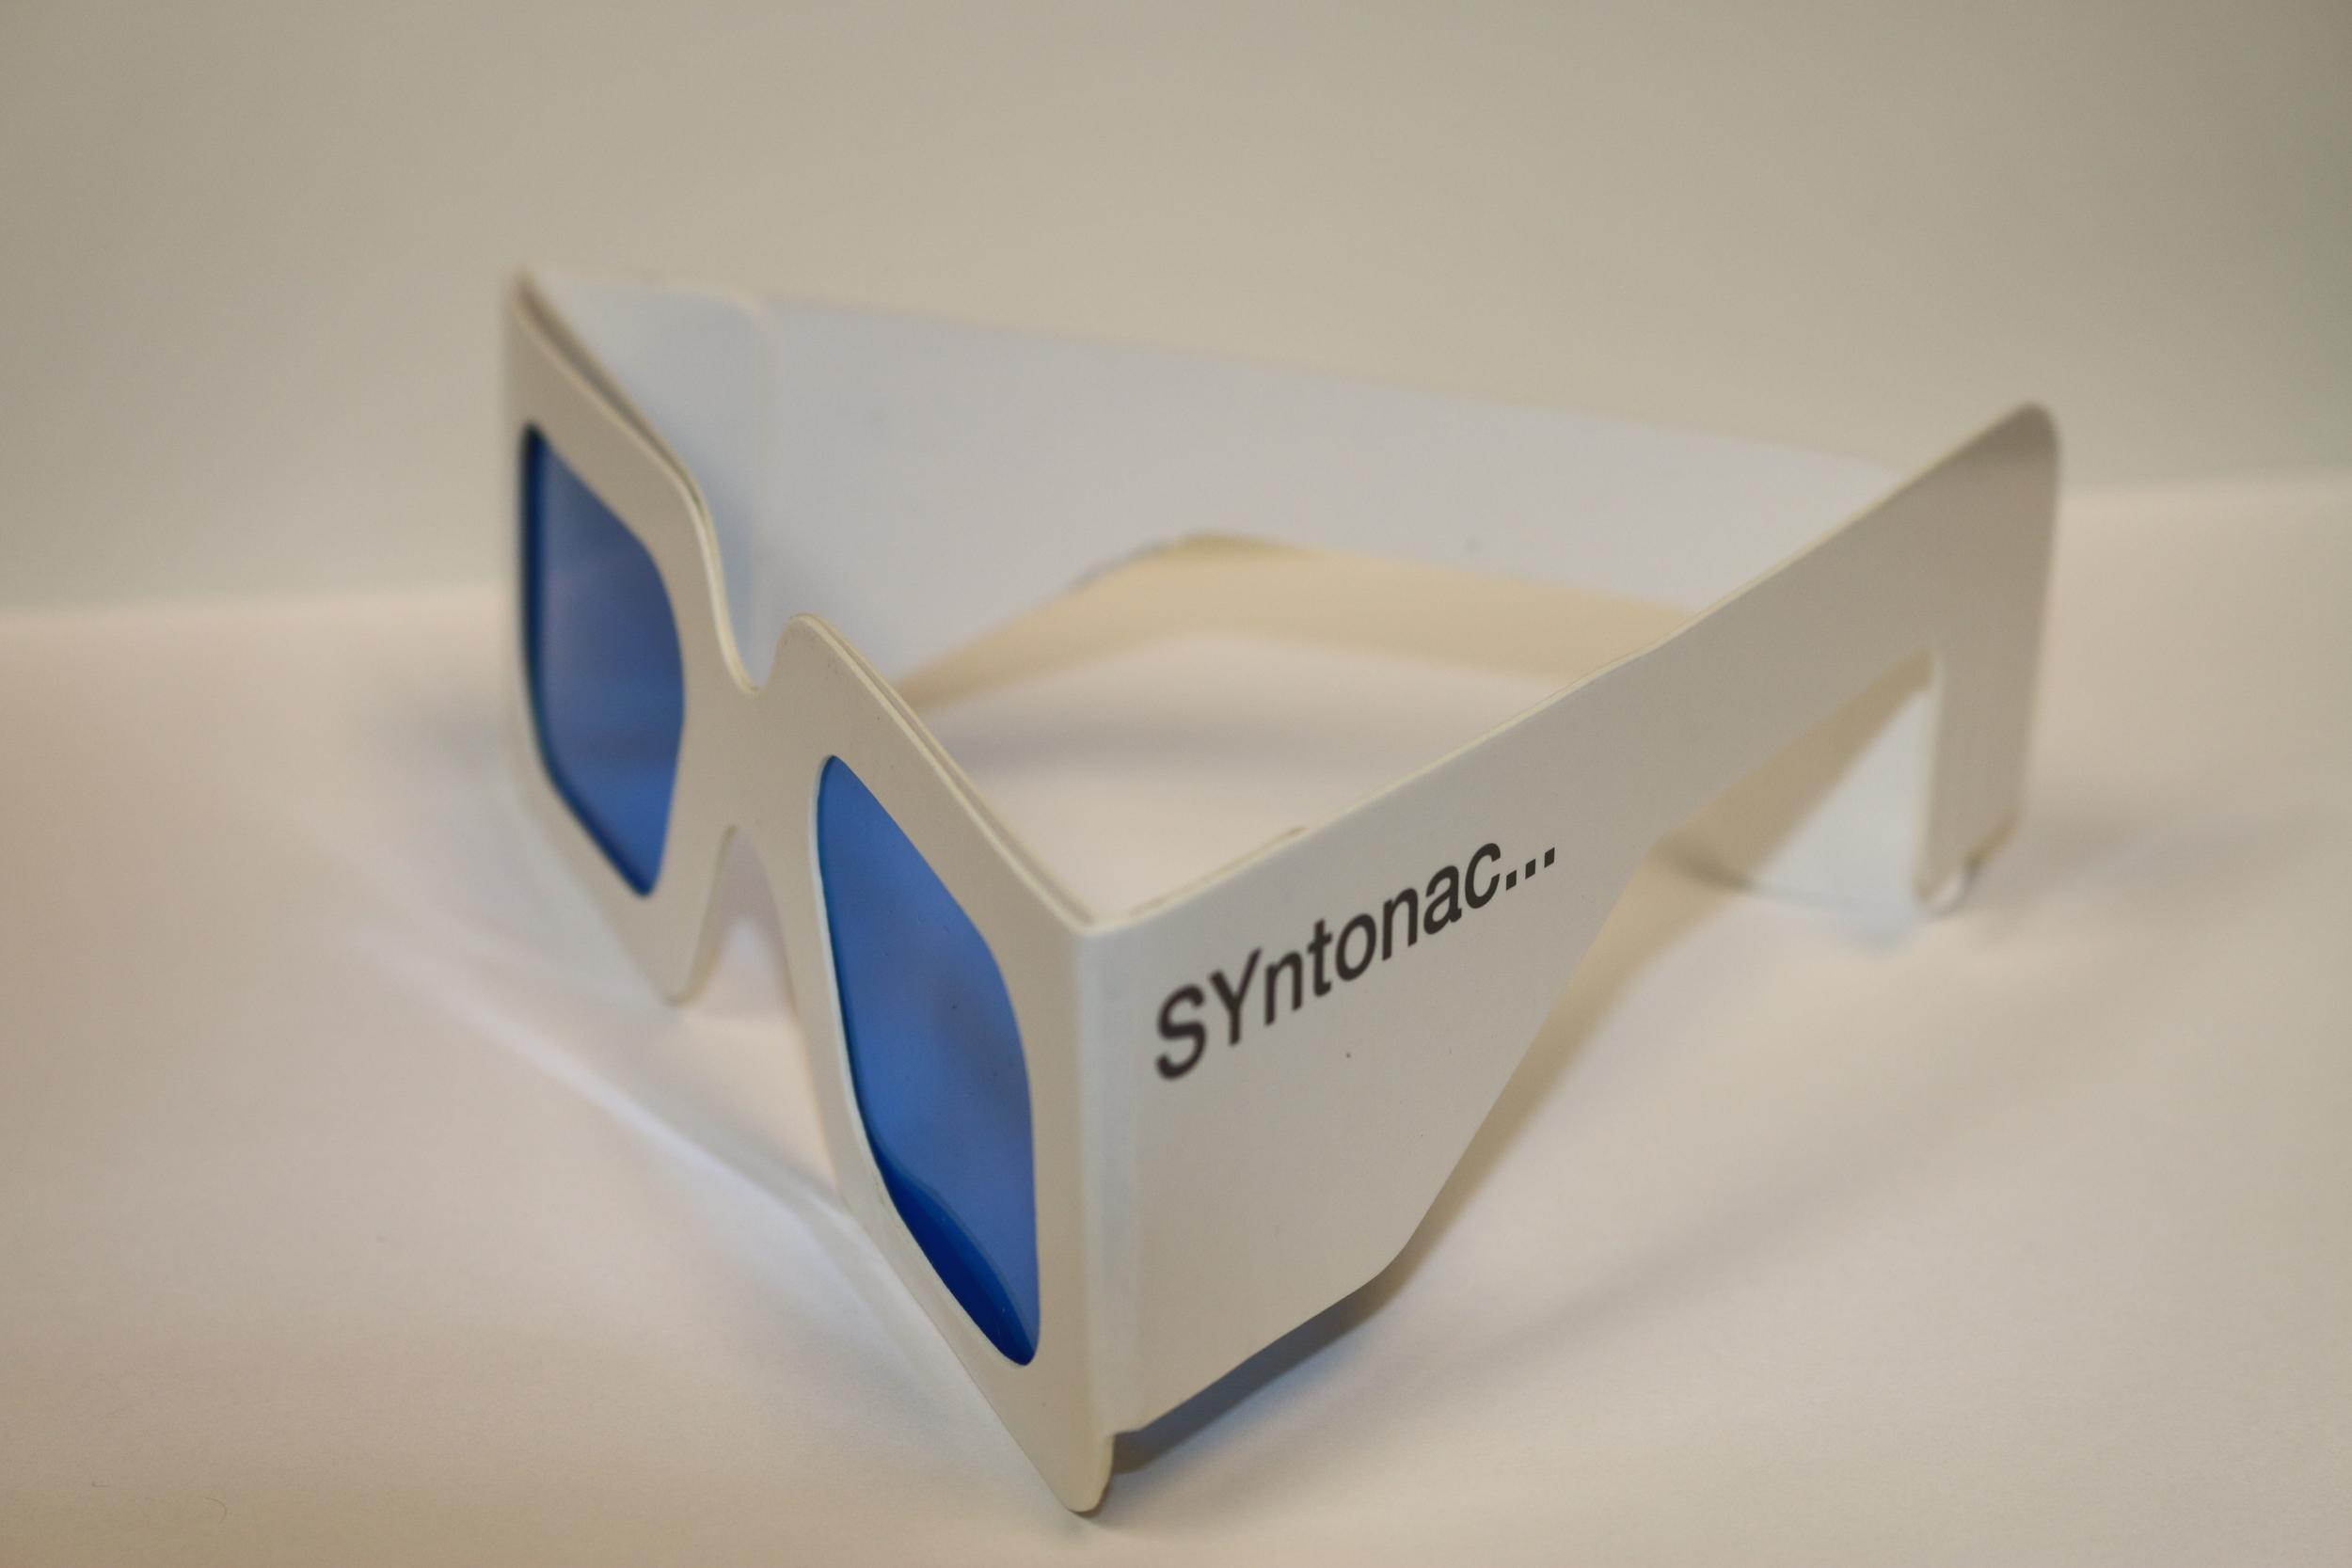 SYntonac